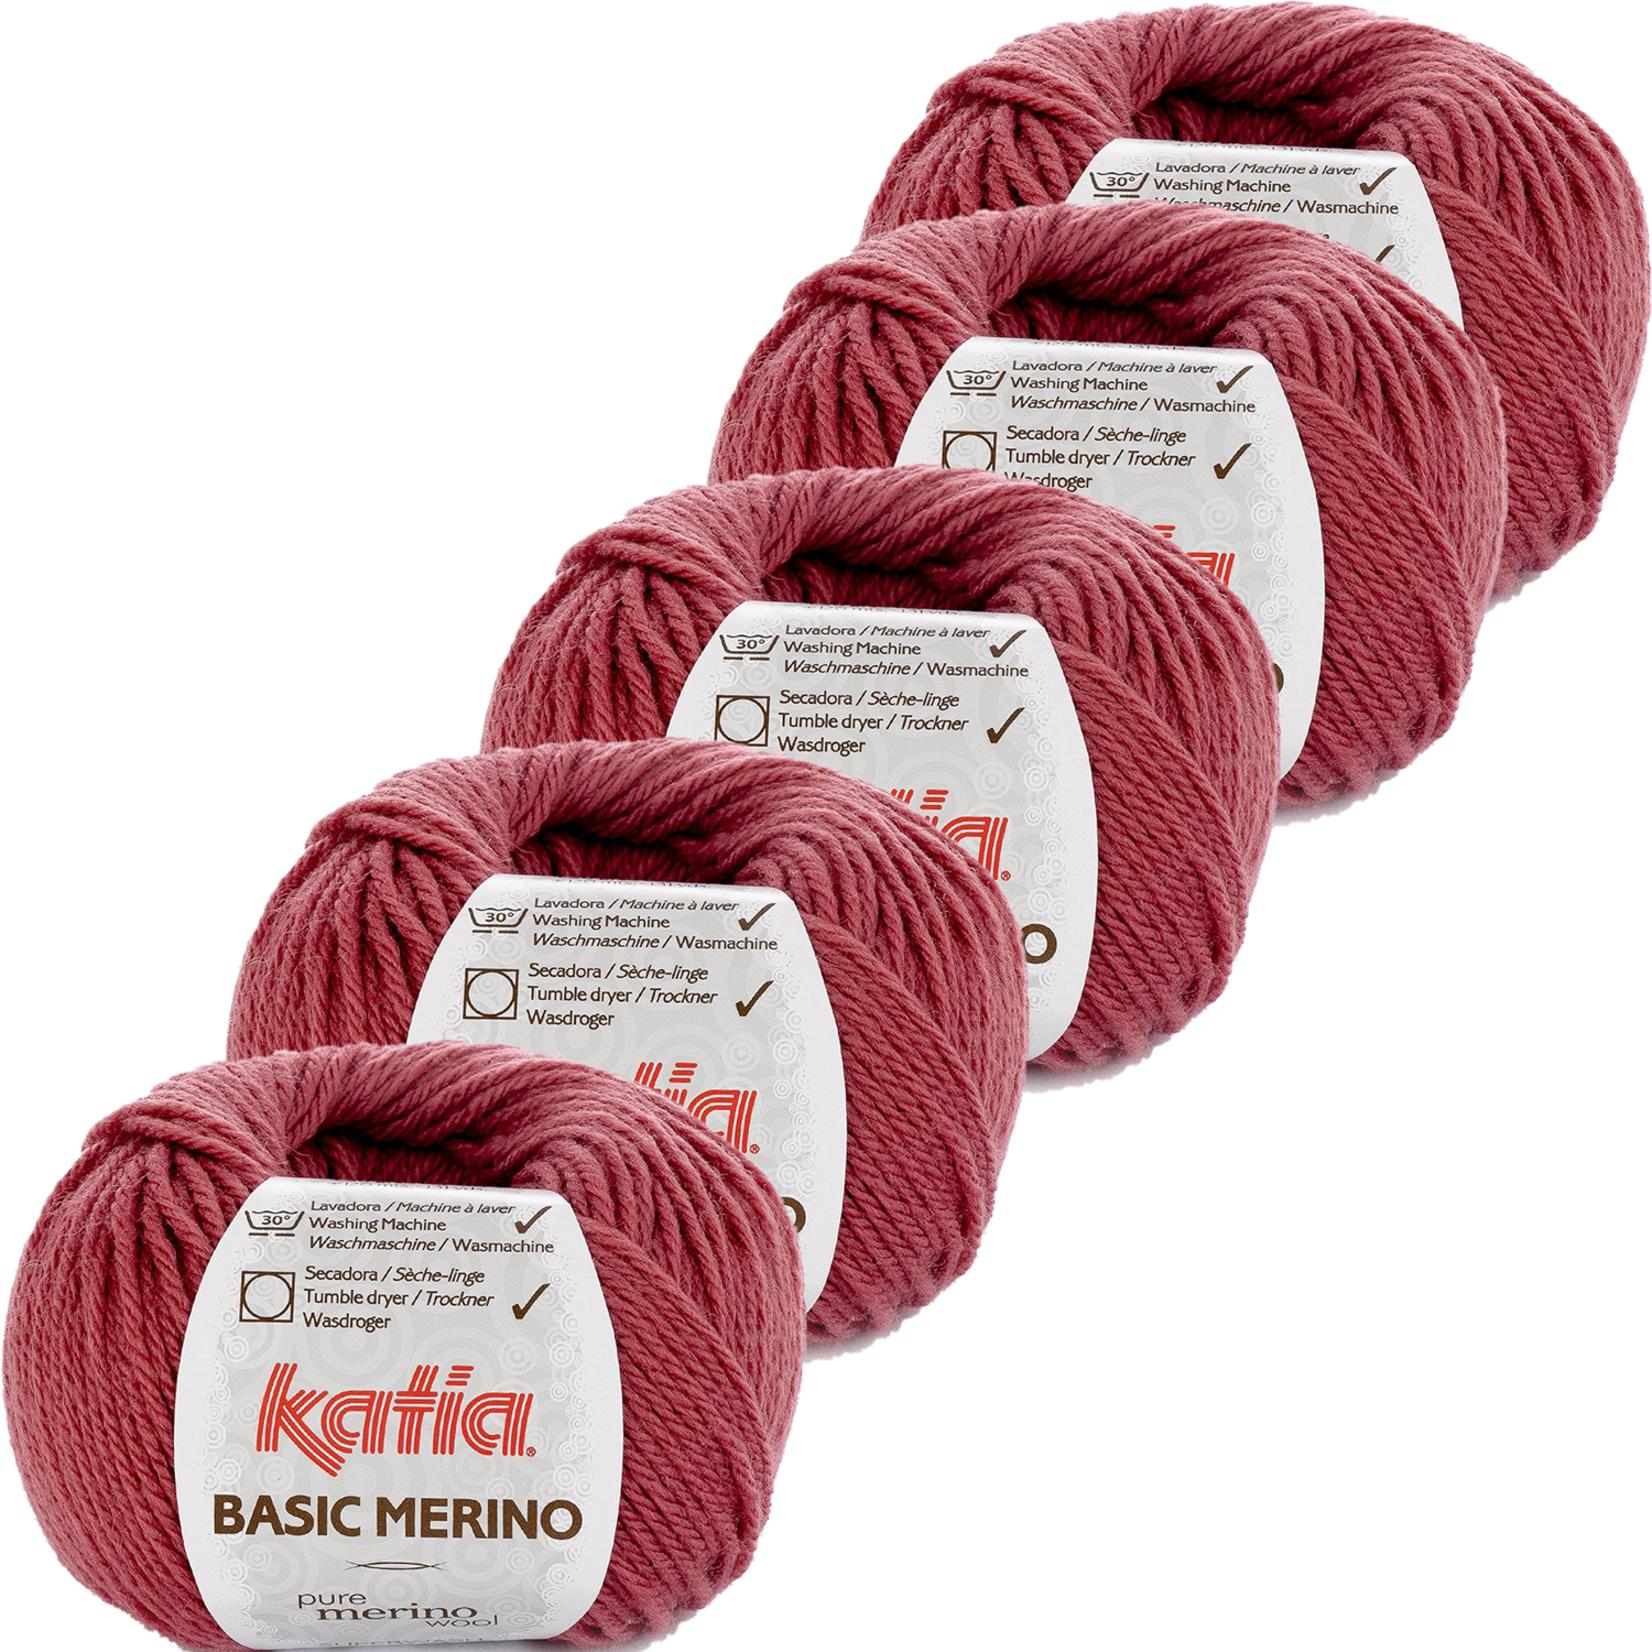 Katia Basic Merino - kleur 75_Framboosrood - bundel 5 bollen 50 gr.  van 120 m.